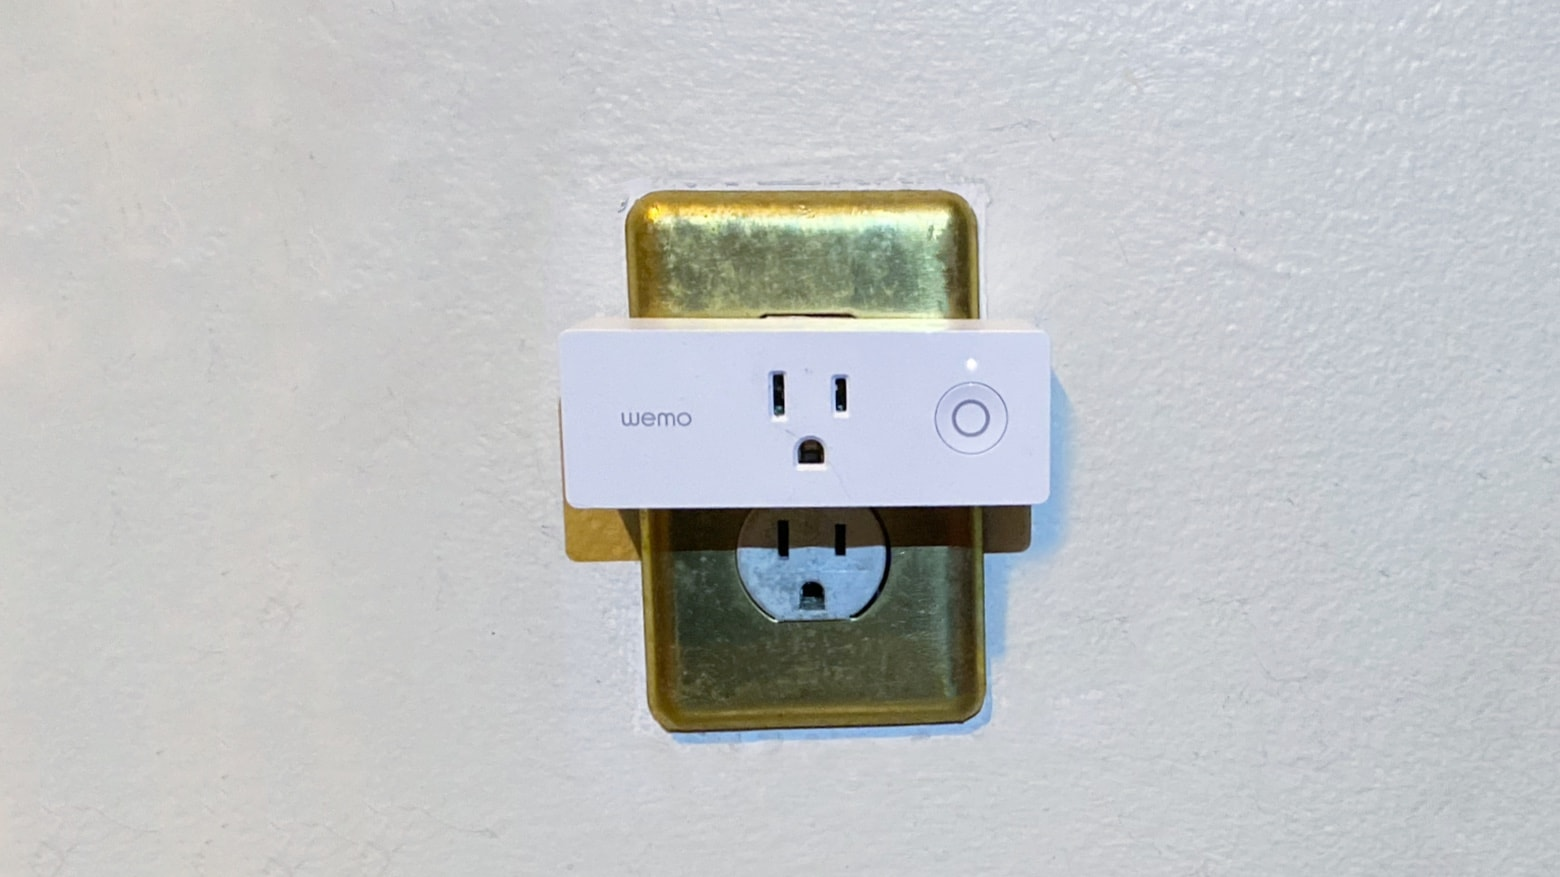 Wemo WiFi Smart Plug is a nice start to home automation